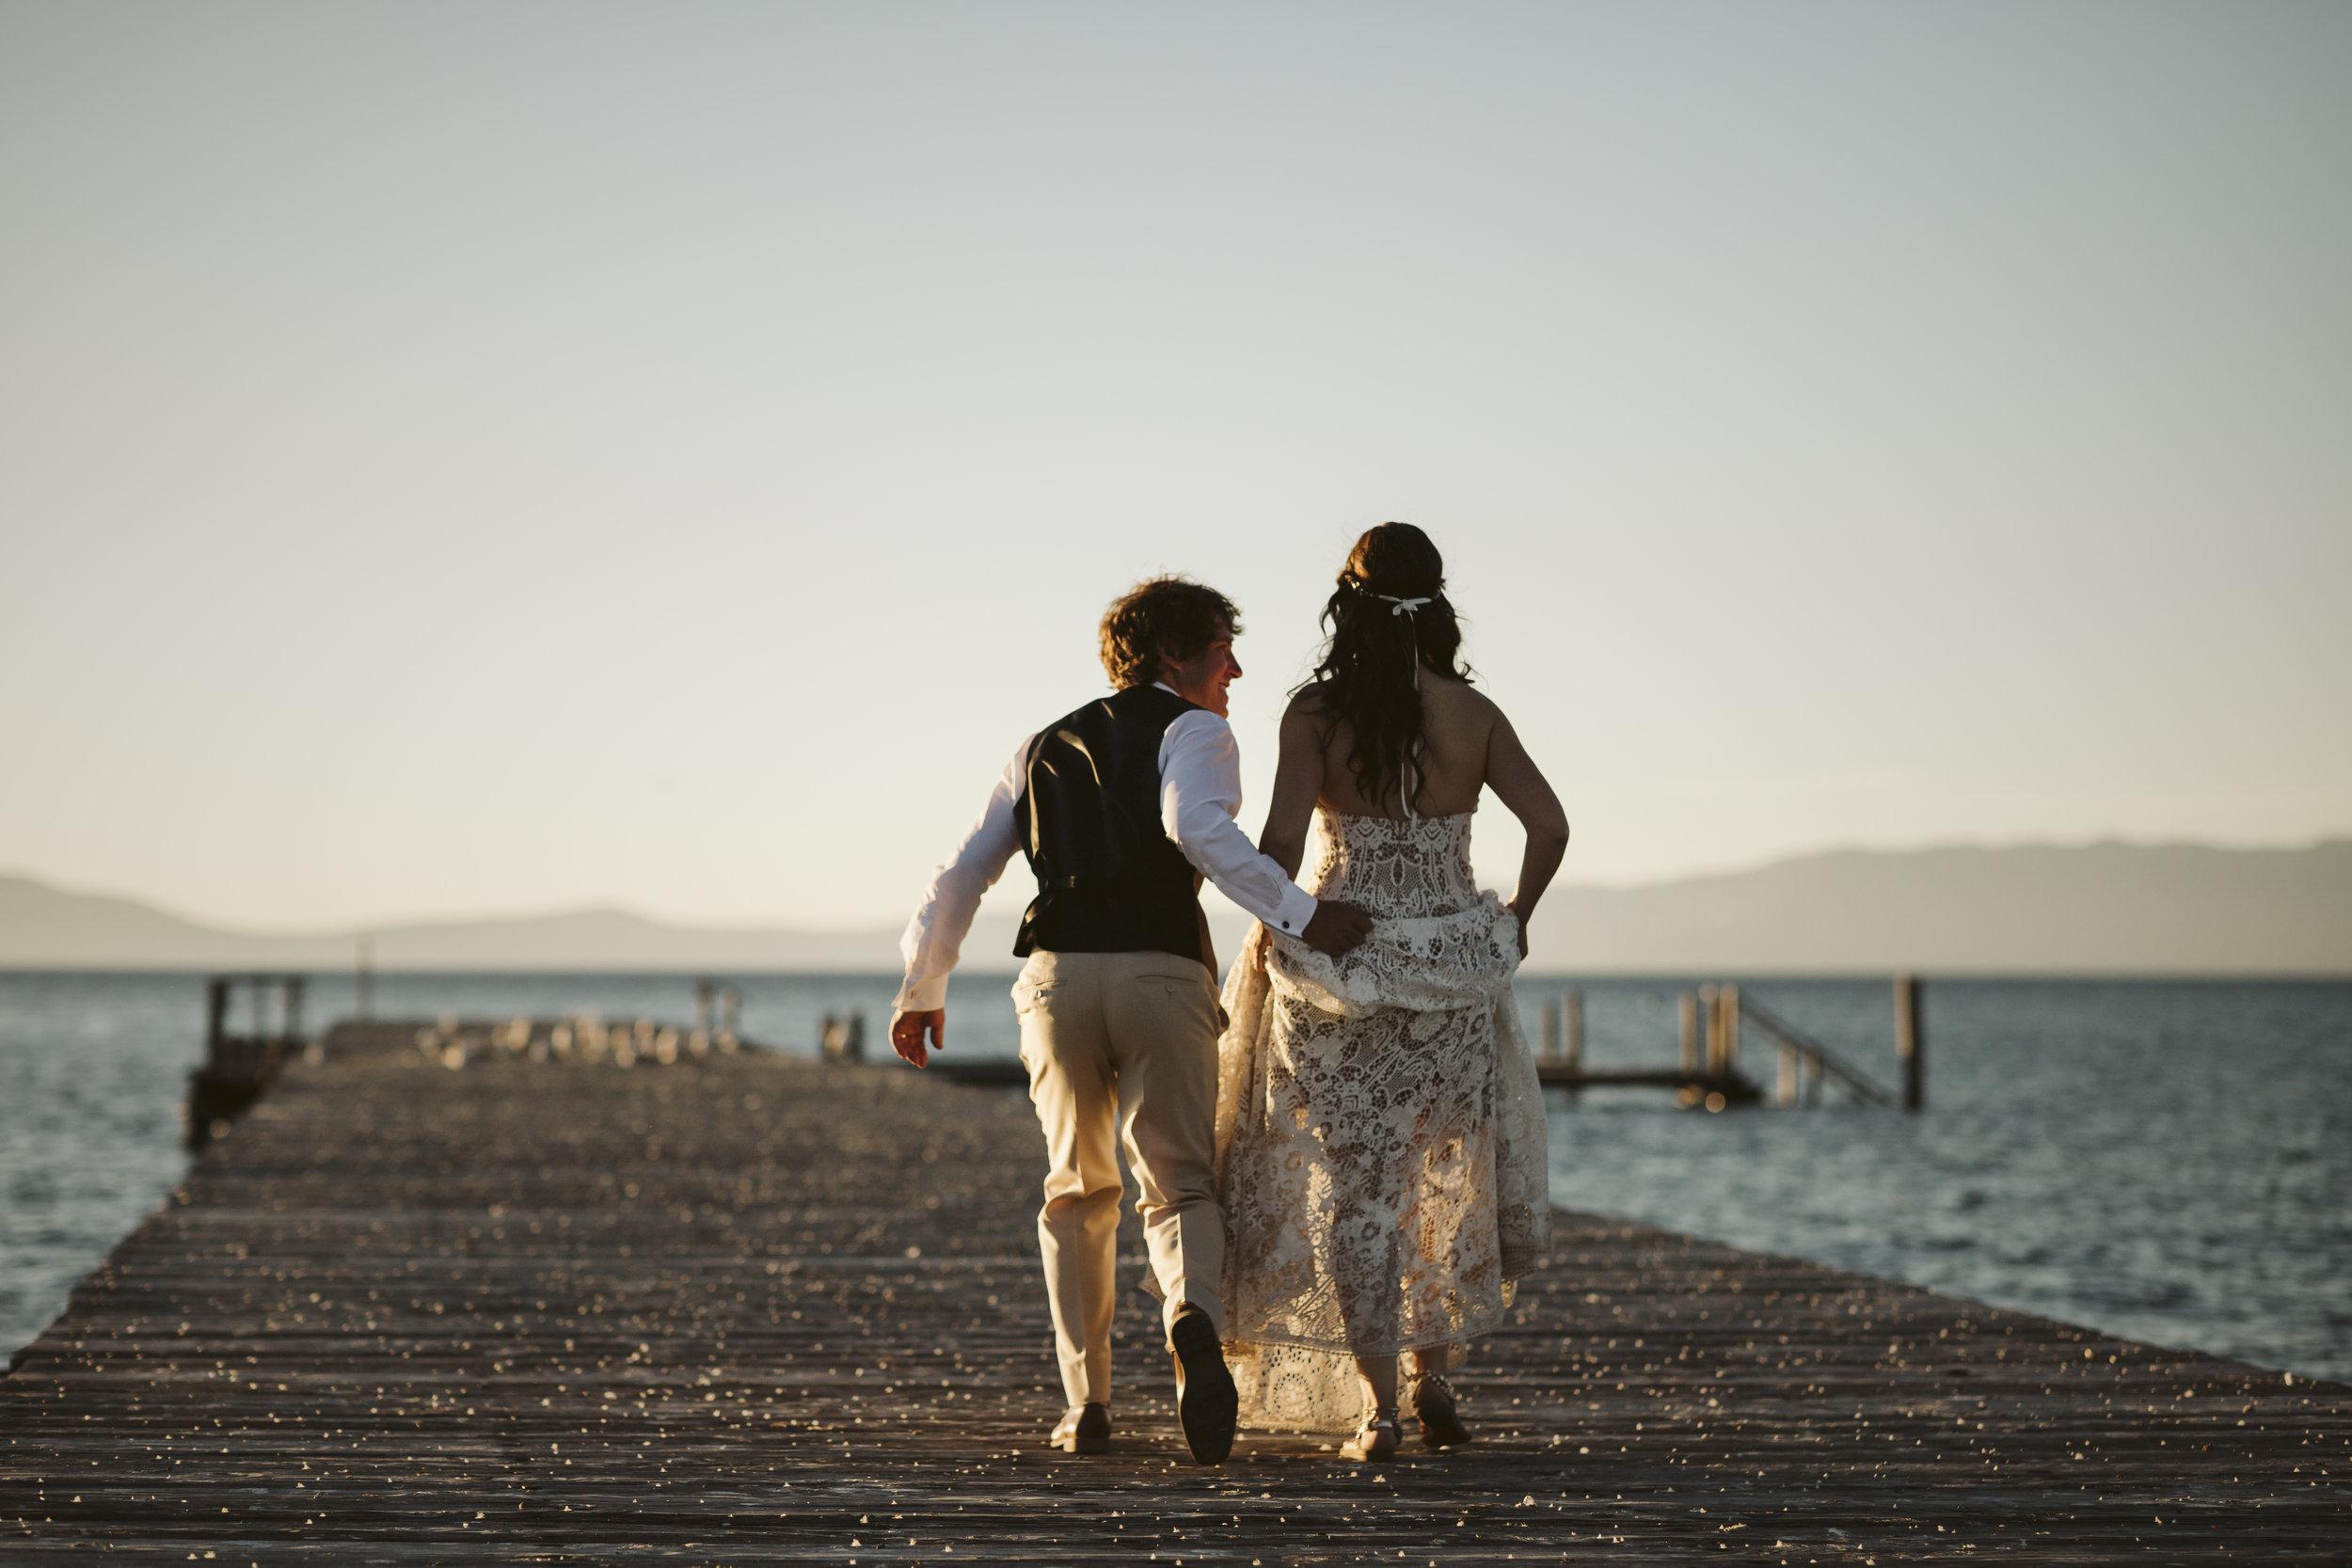 _MG_4667vildphotography-adventurewedding-tahoewedding-tahoeweddings-laketahoeweddingphotographer-californiawedding-shelly-cody.jpg